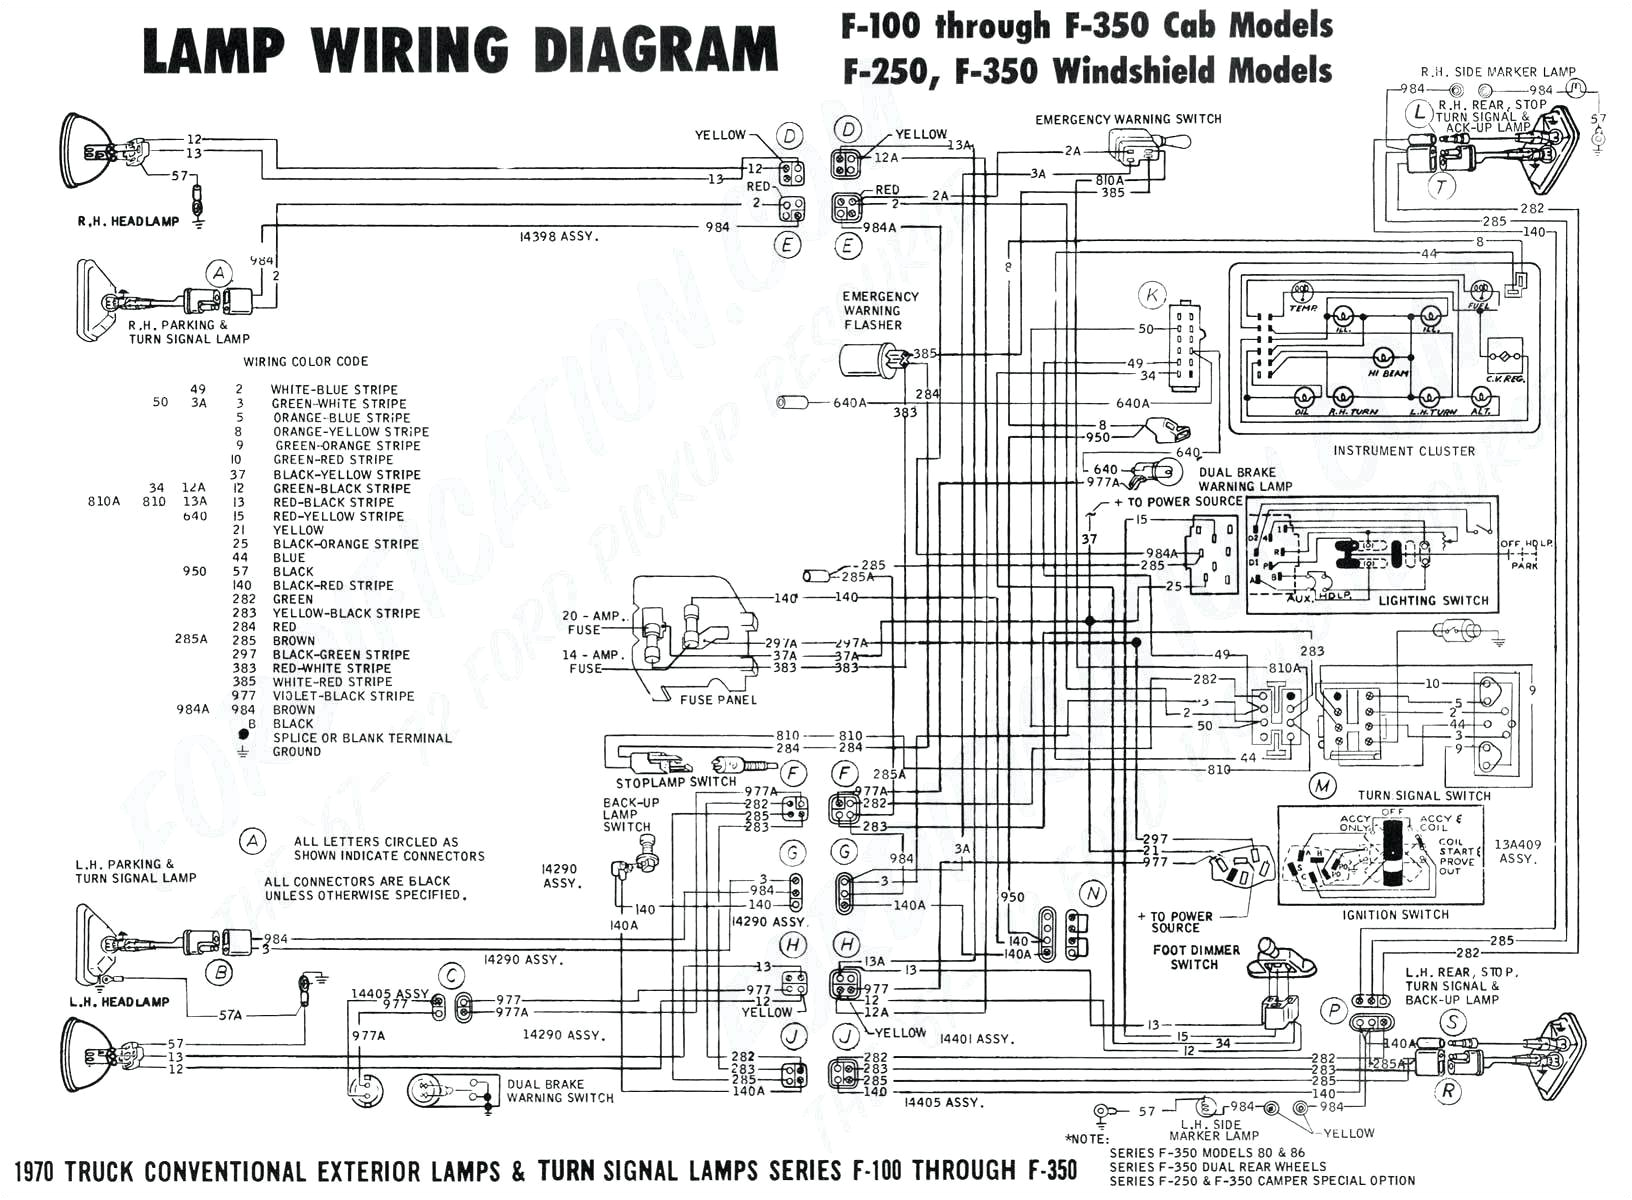 1989 cadillac brougham wiring diagram wiring diagram 2000 audi tt fuse diagram on harley davidson throttle cable diagram